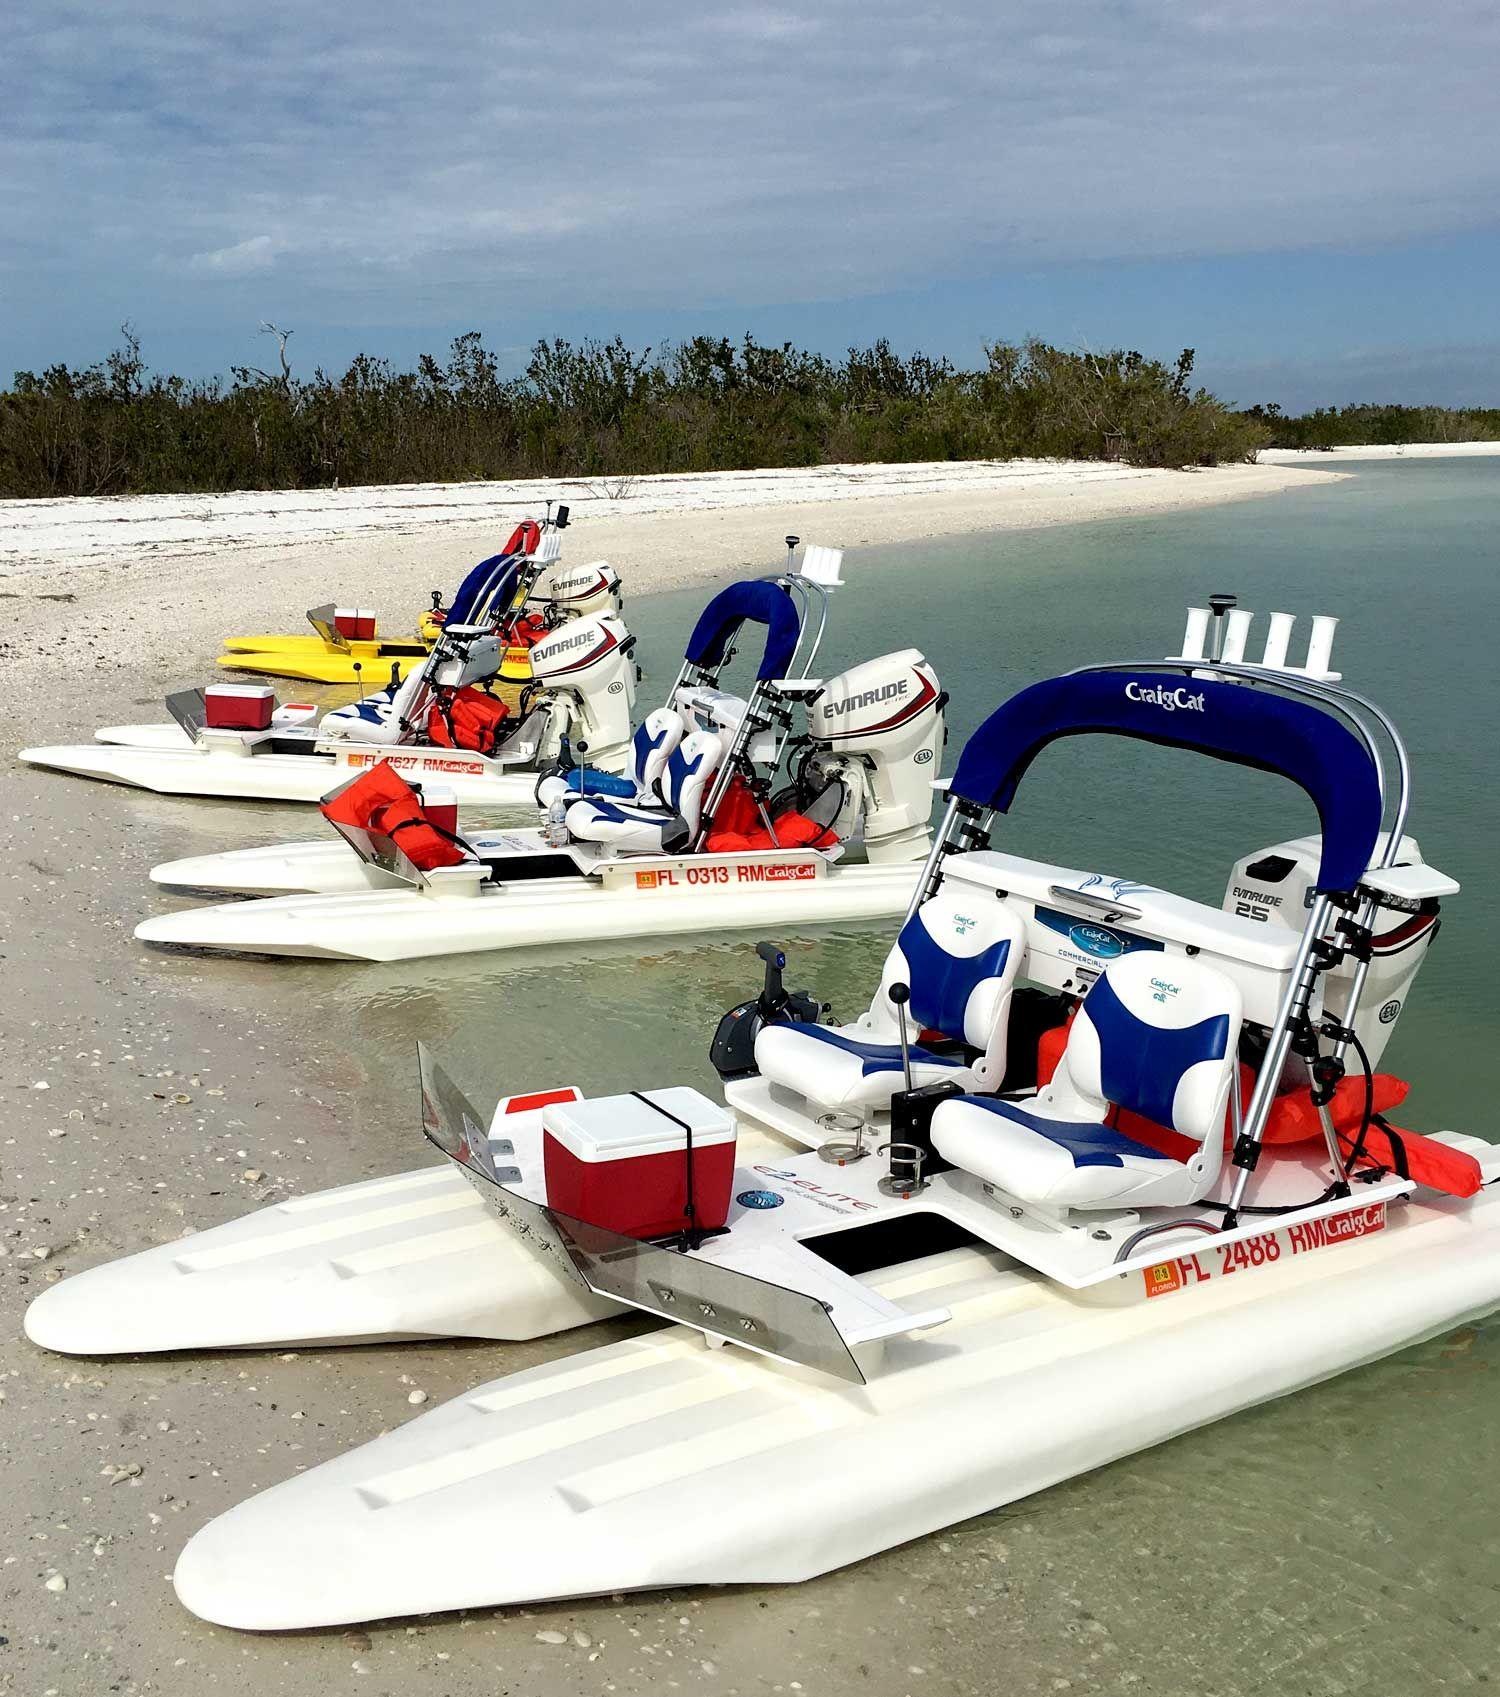 Koolcat eco tours craigcat boat rental marco island